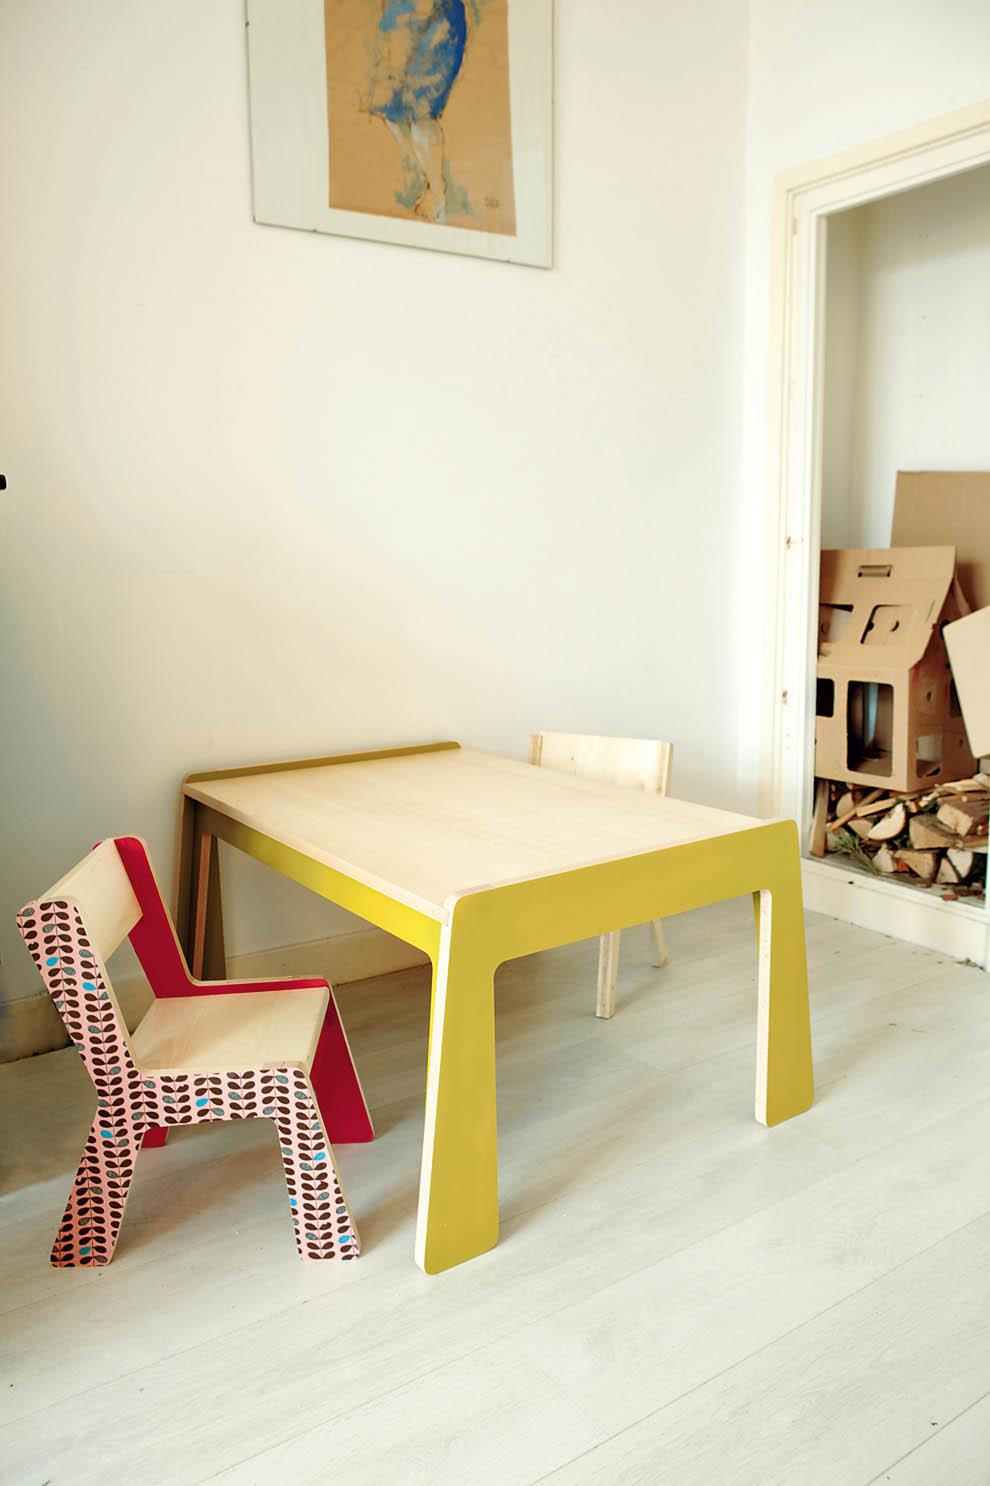 mobiliario diseñado por la familia / family designed furniture